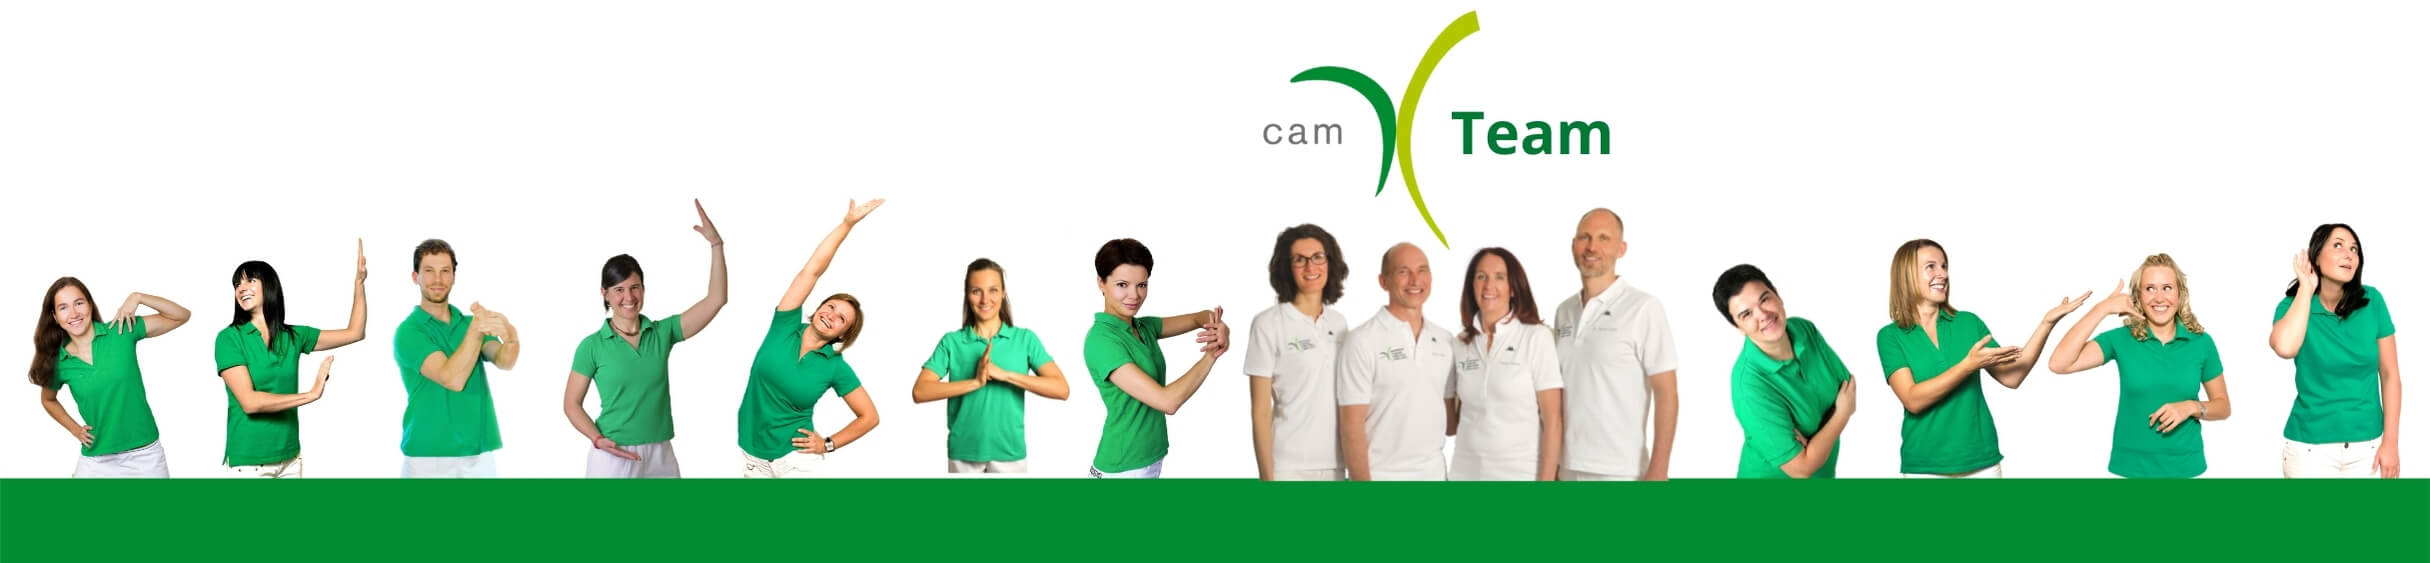 Jobs Team Cam